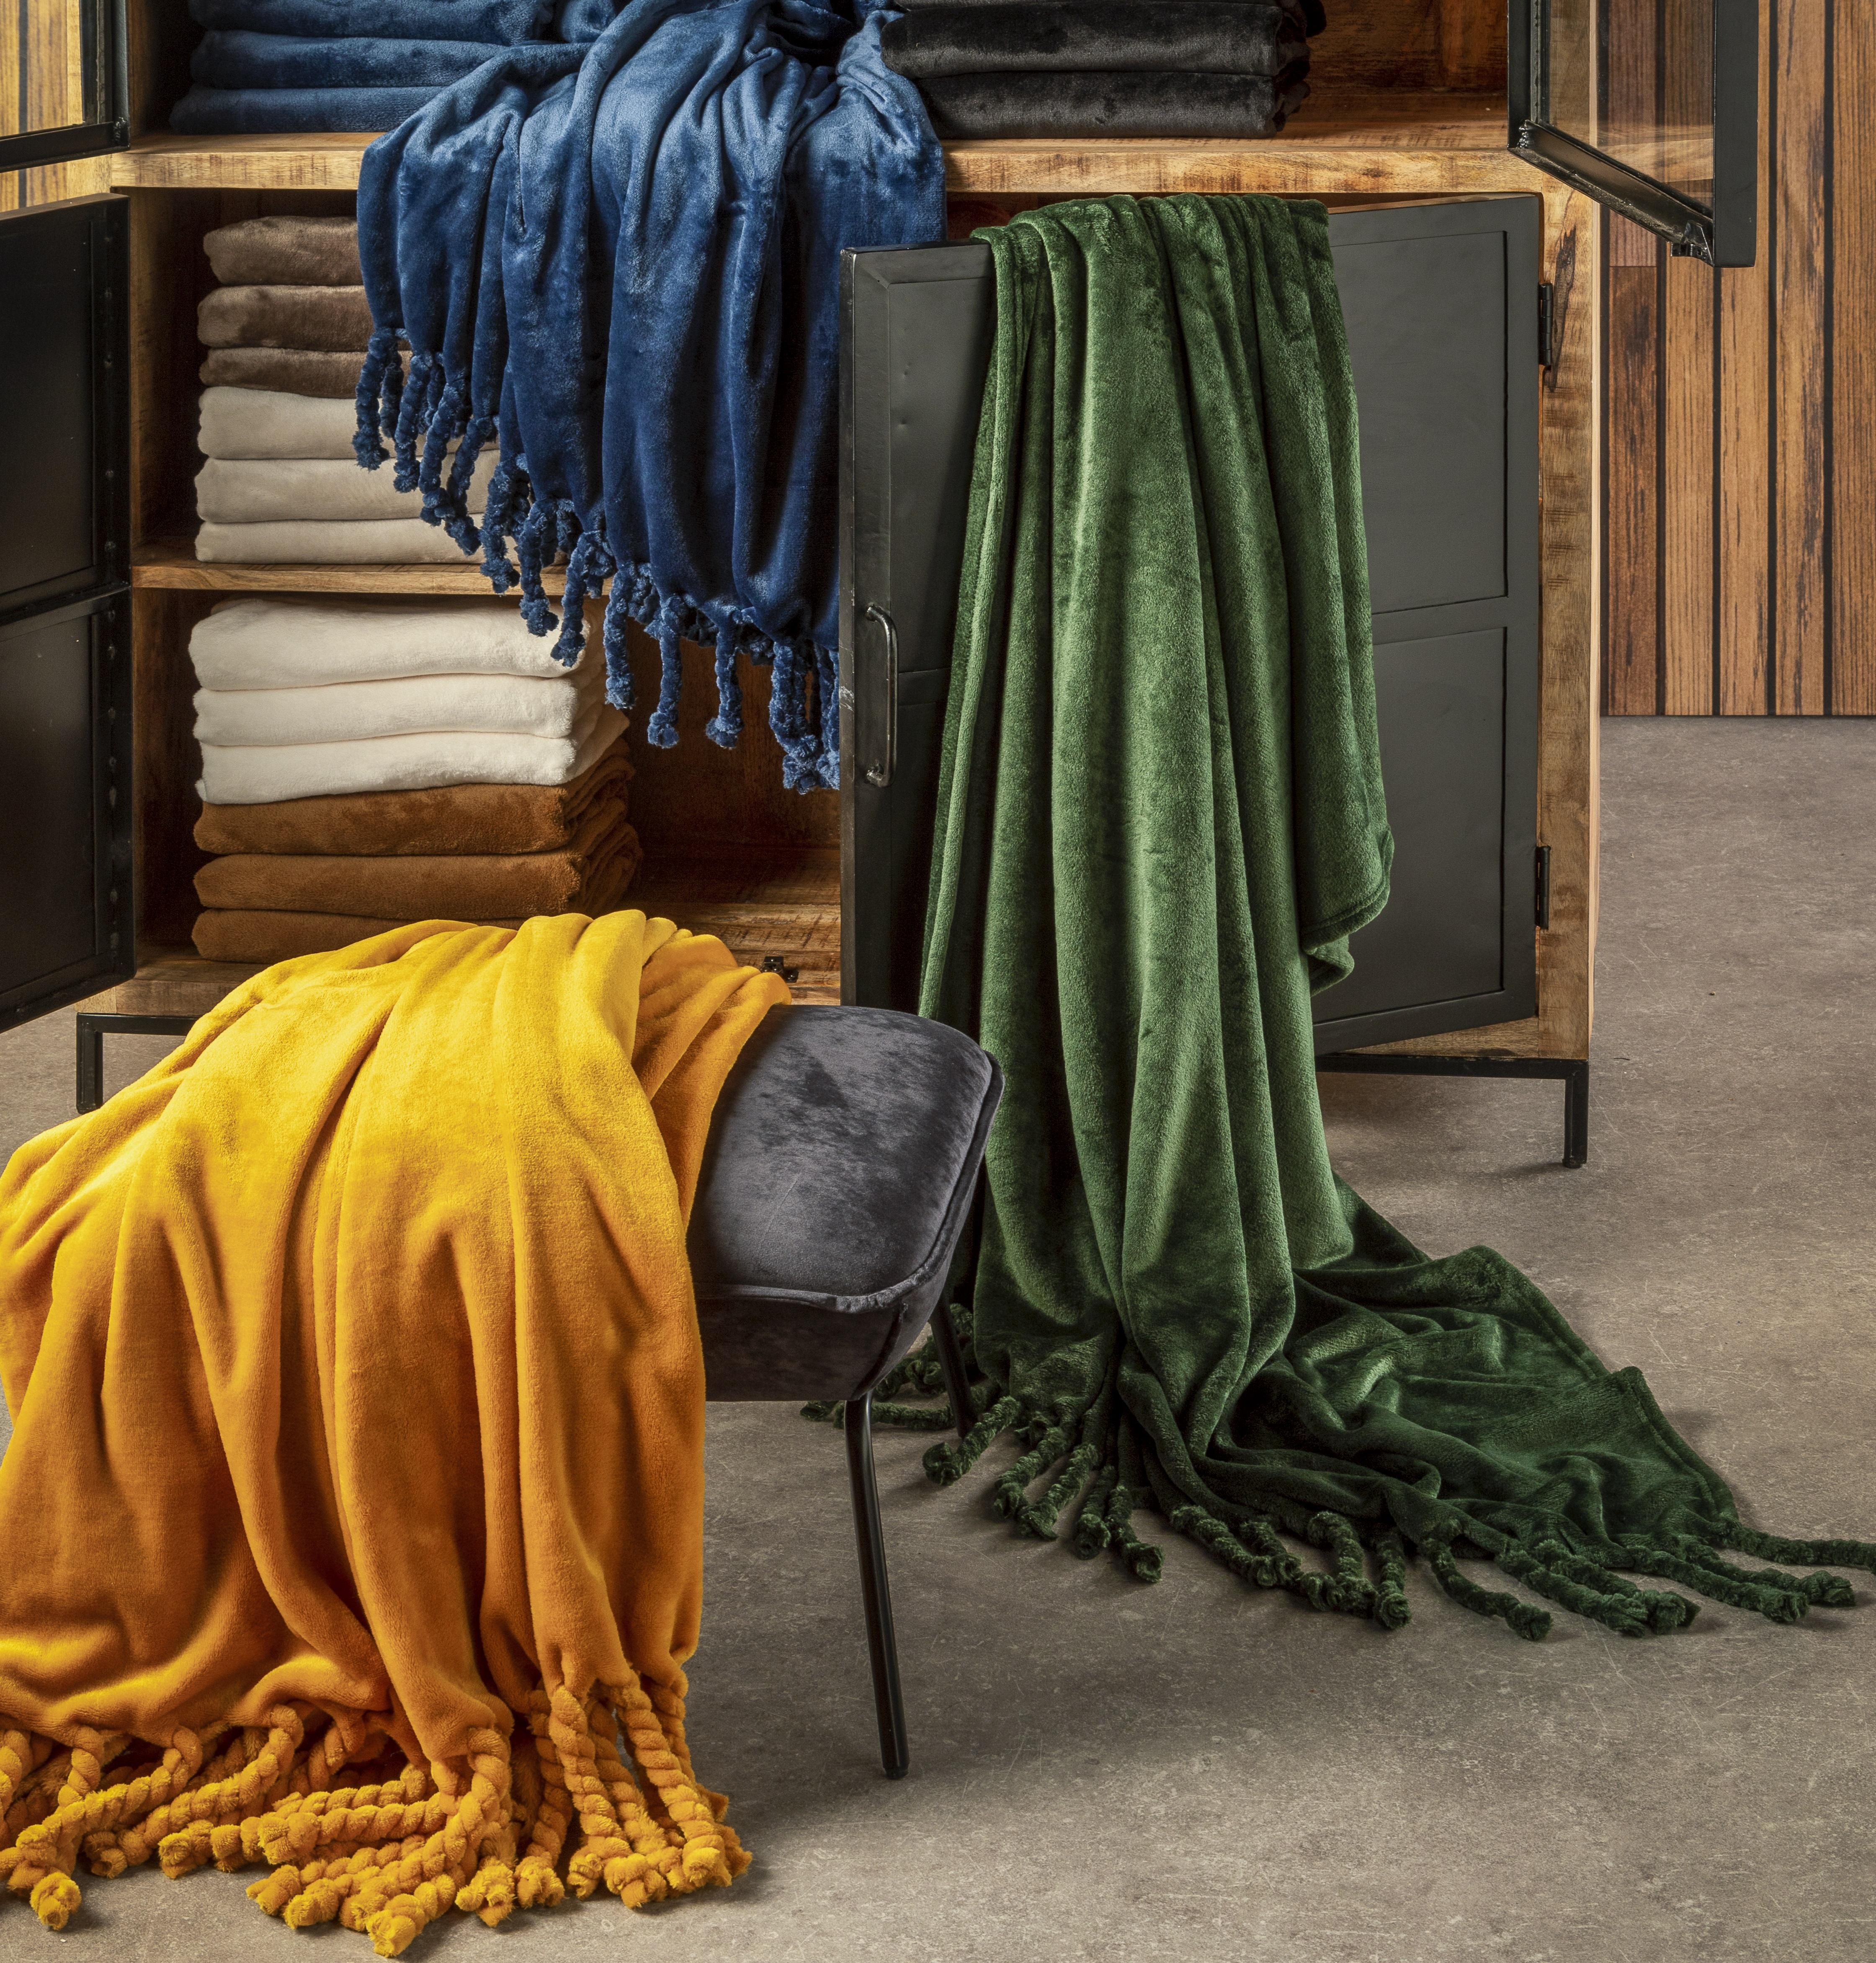 FLORIJN - Plaid van fleece 150x200 cm Insignia Blue